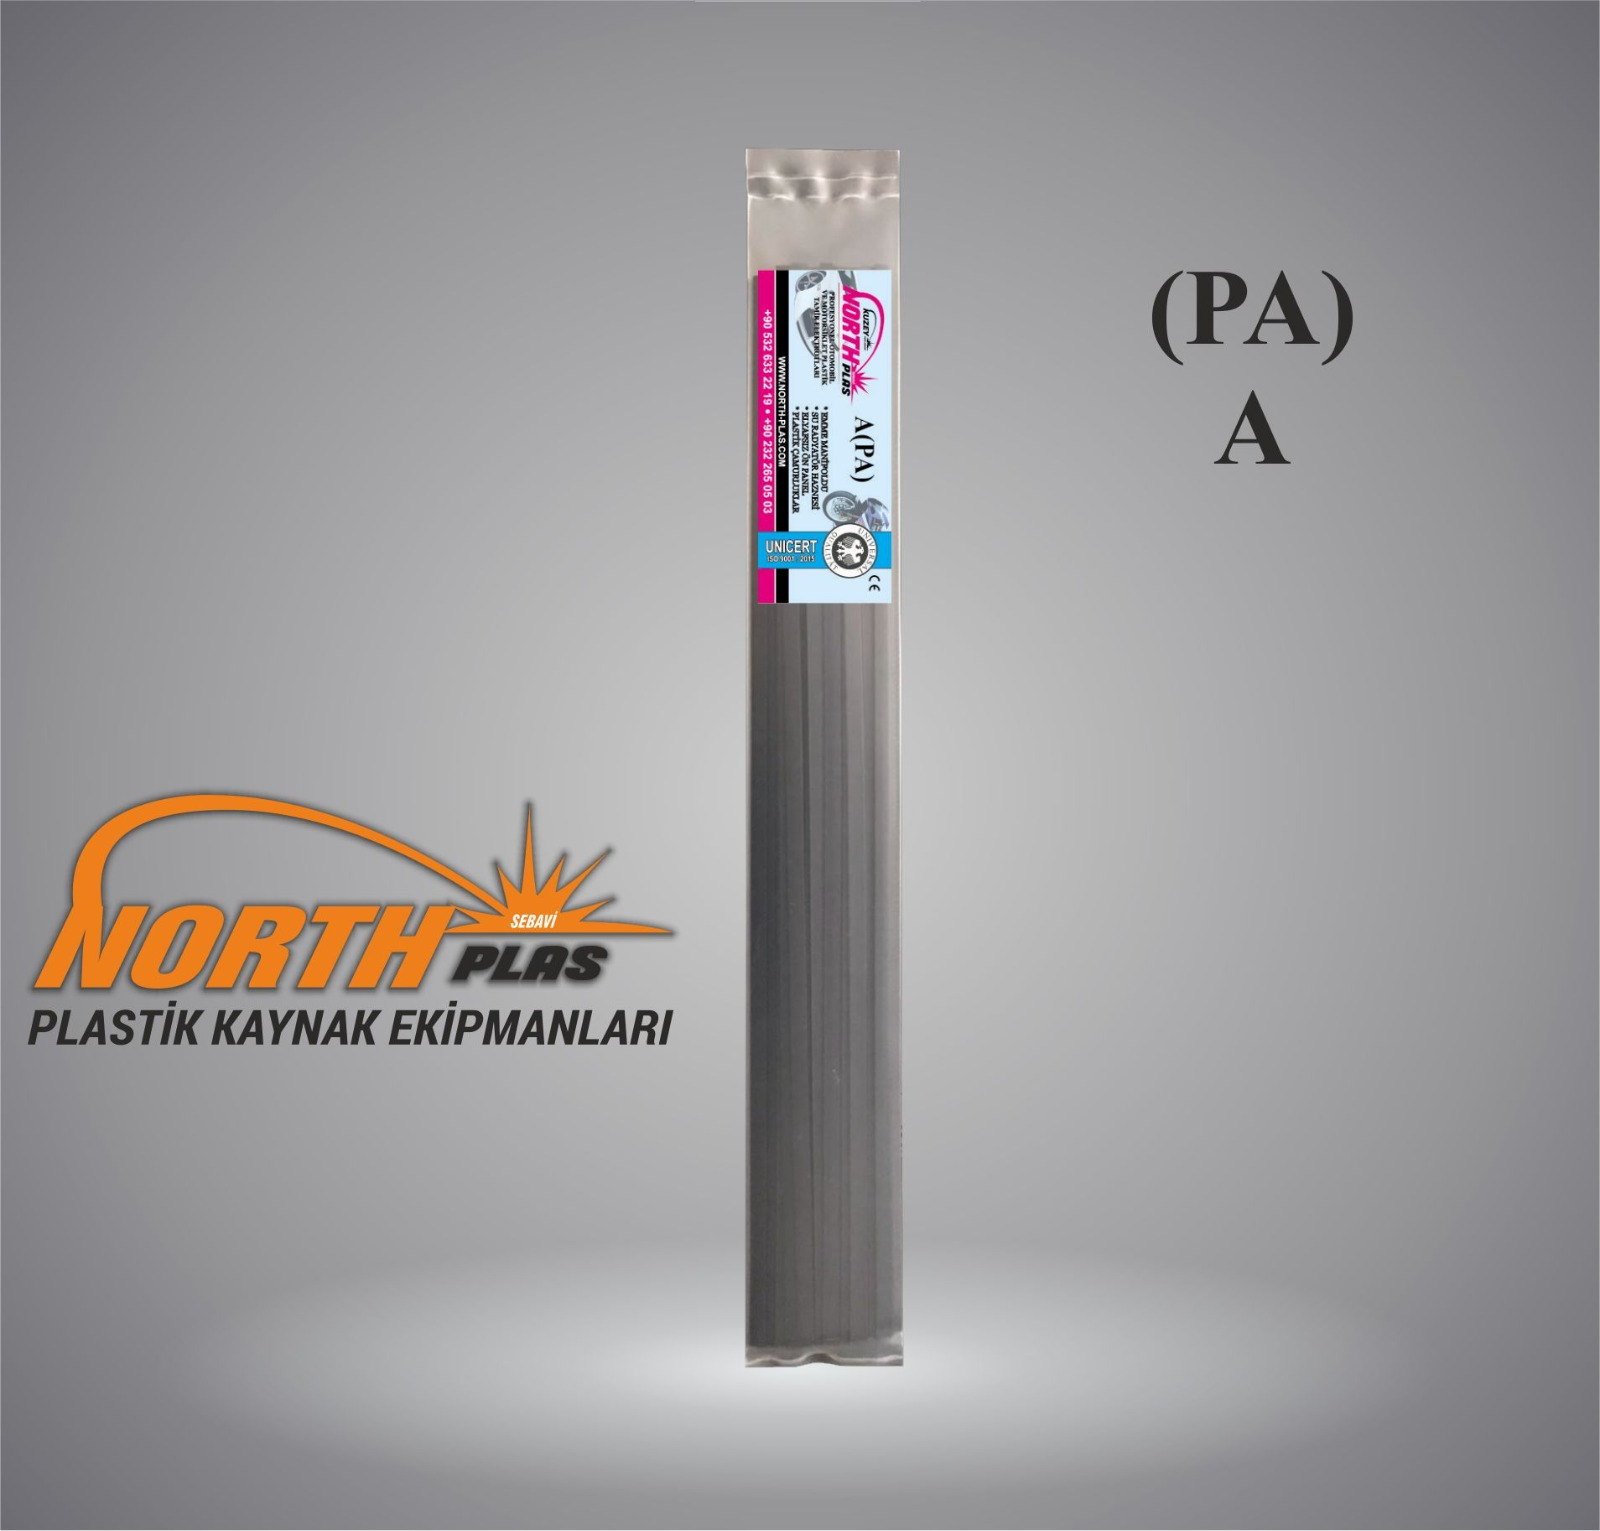 North Plas-KAYNAK ÇUBUK (A) PA (POLYAMİD) DAR SİYAH 7 MM (PAKET İÇİ 24 ADET ) Plastik Kaynak Elektrot